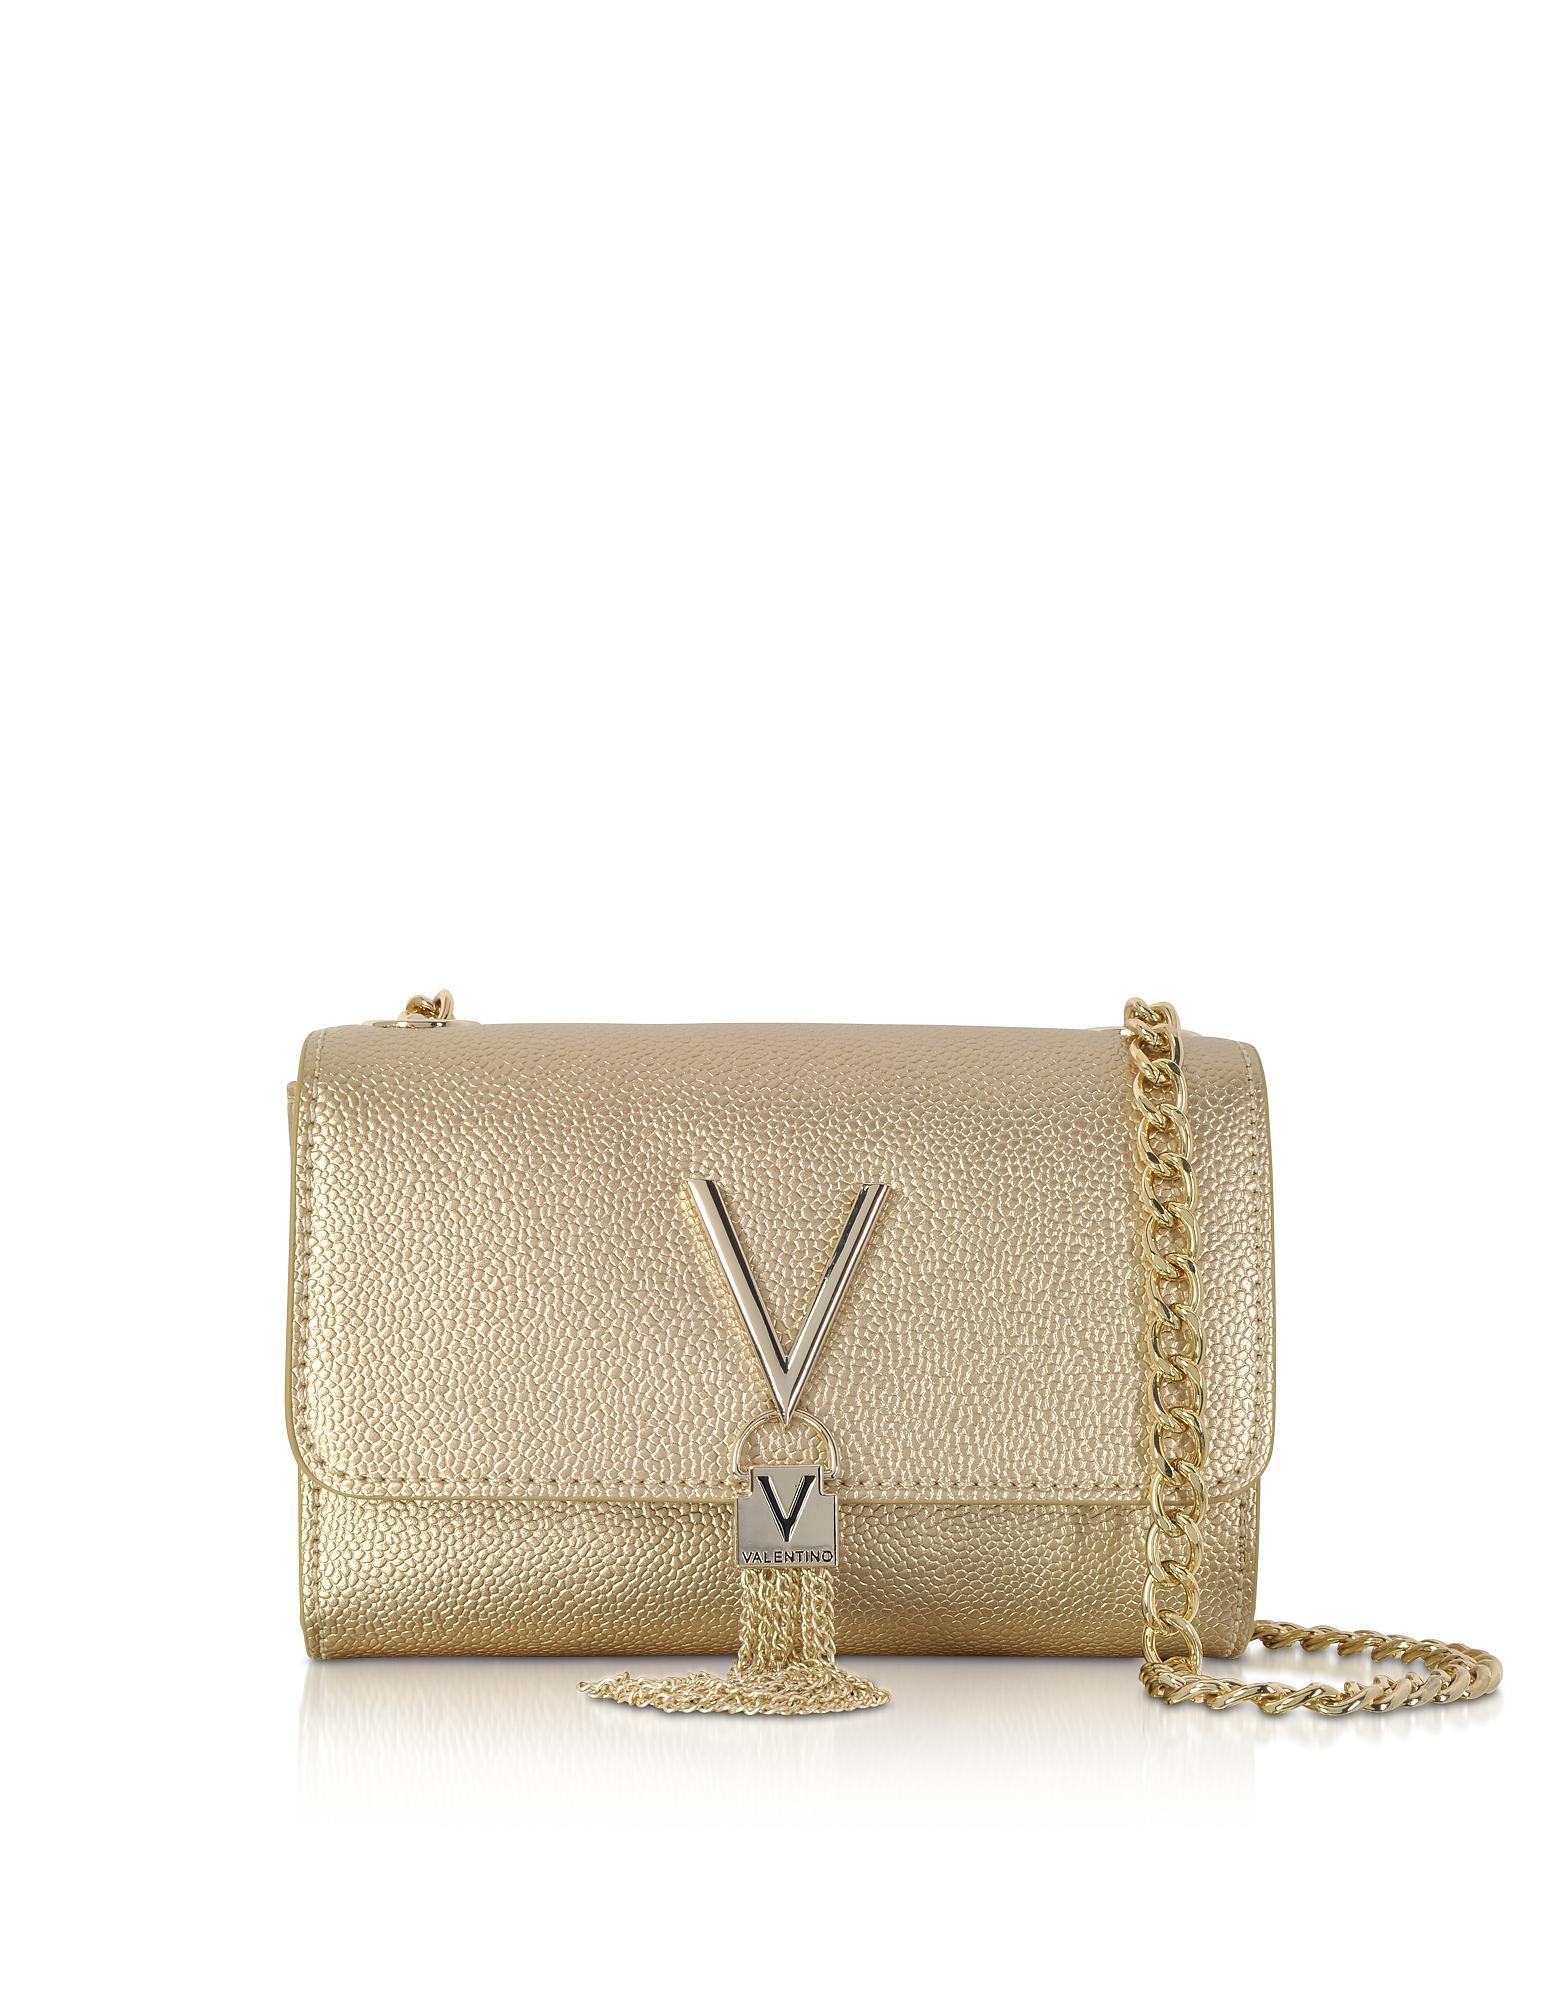 Valentino by Mario Valentino Handbags, Eco Leather Divina Shoulder Bag